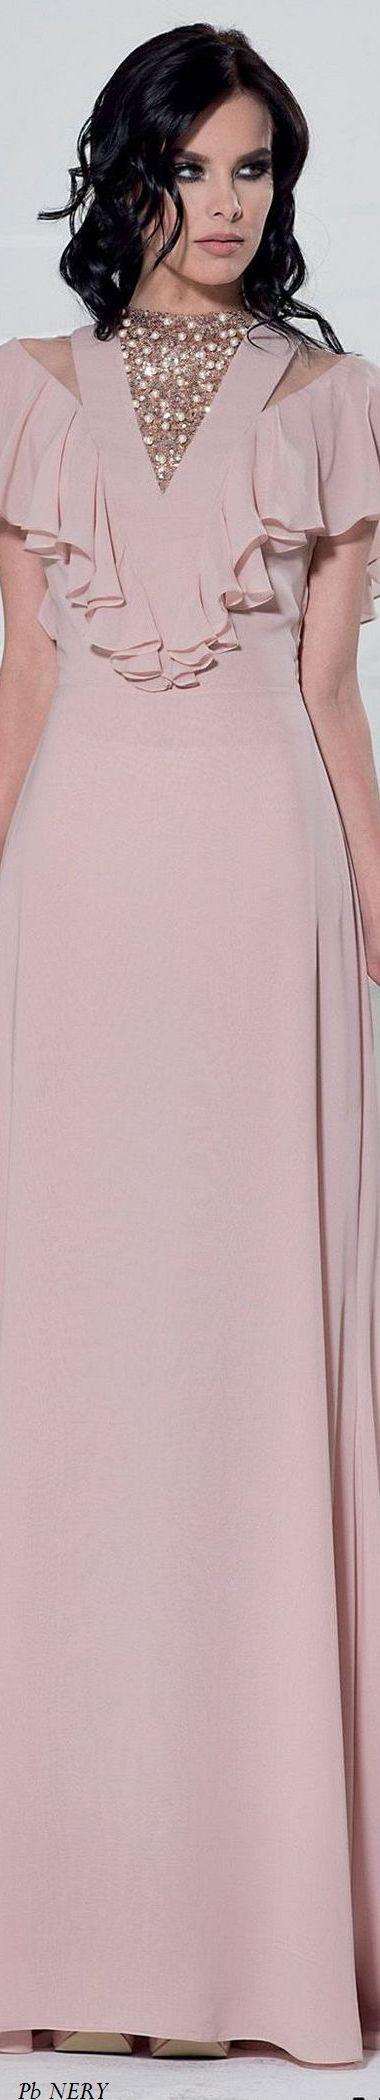 Antonios Couture Fall-Winter 2017/2018